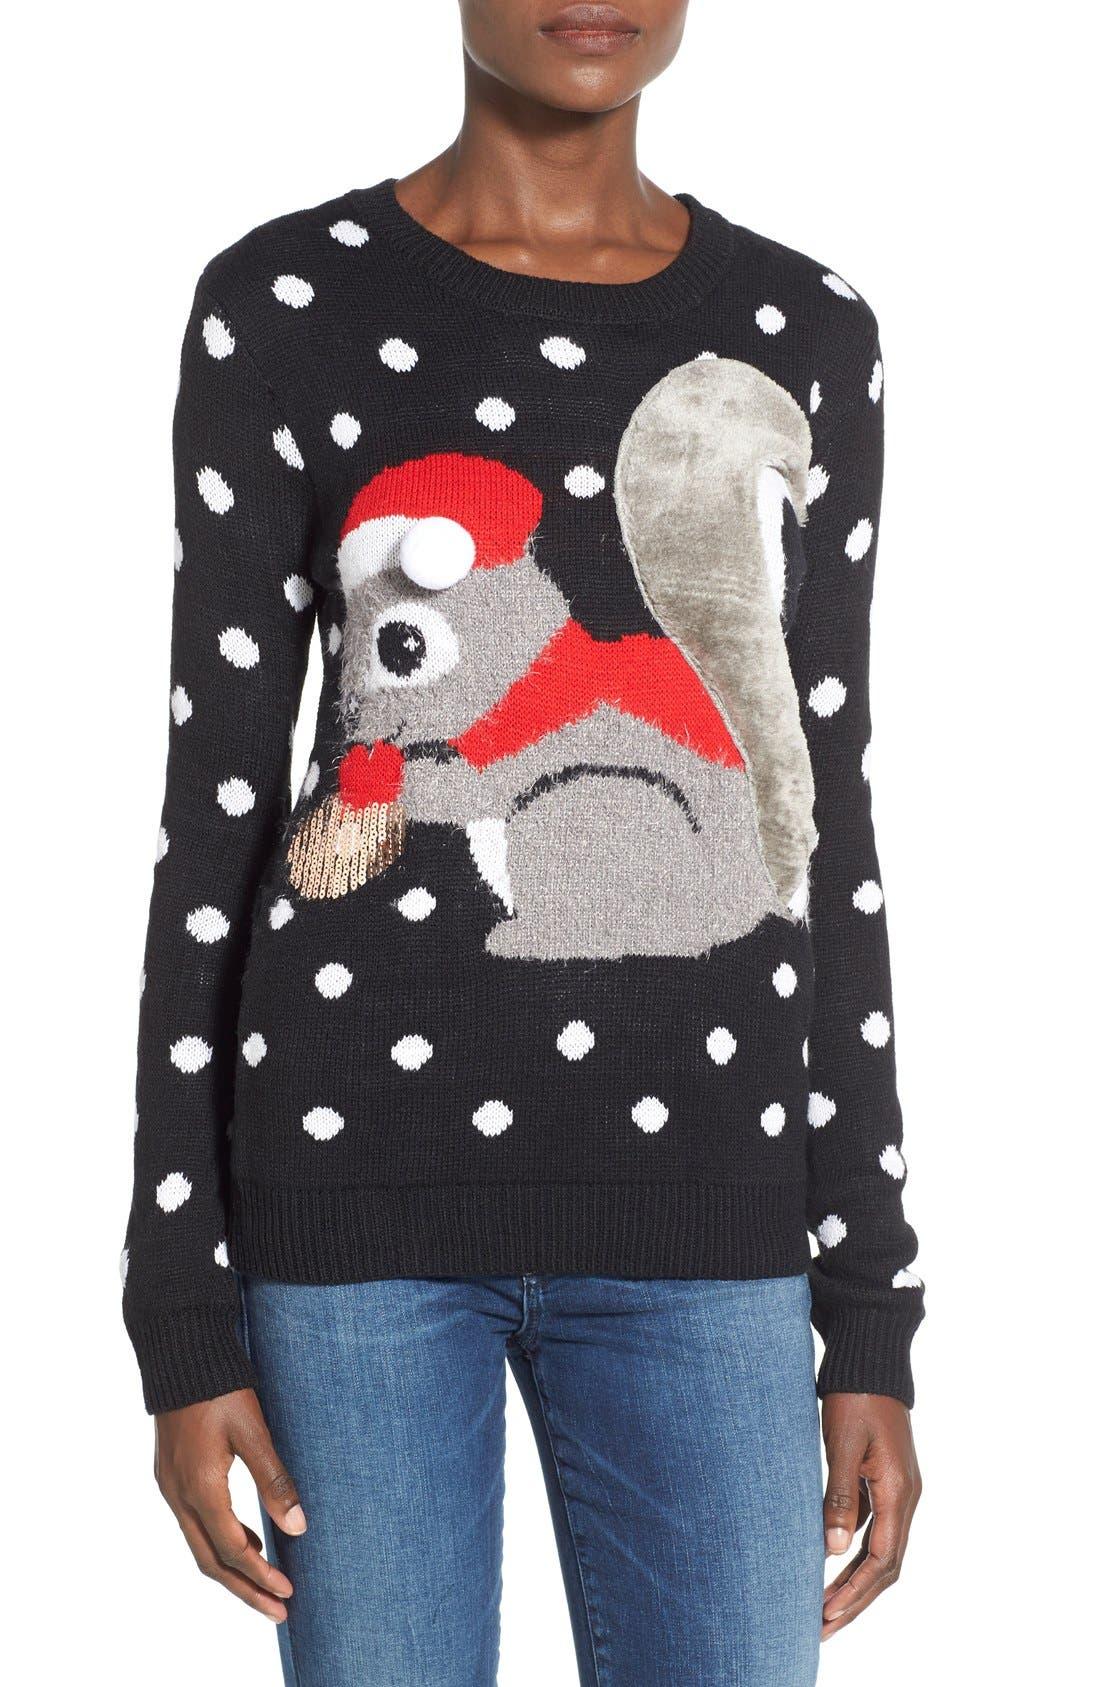 TEN SIXTY SHERMAN Squirrel Christmas Sweater, Main, color, 001